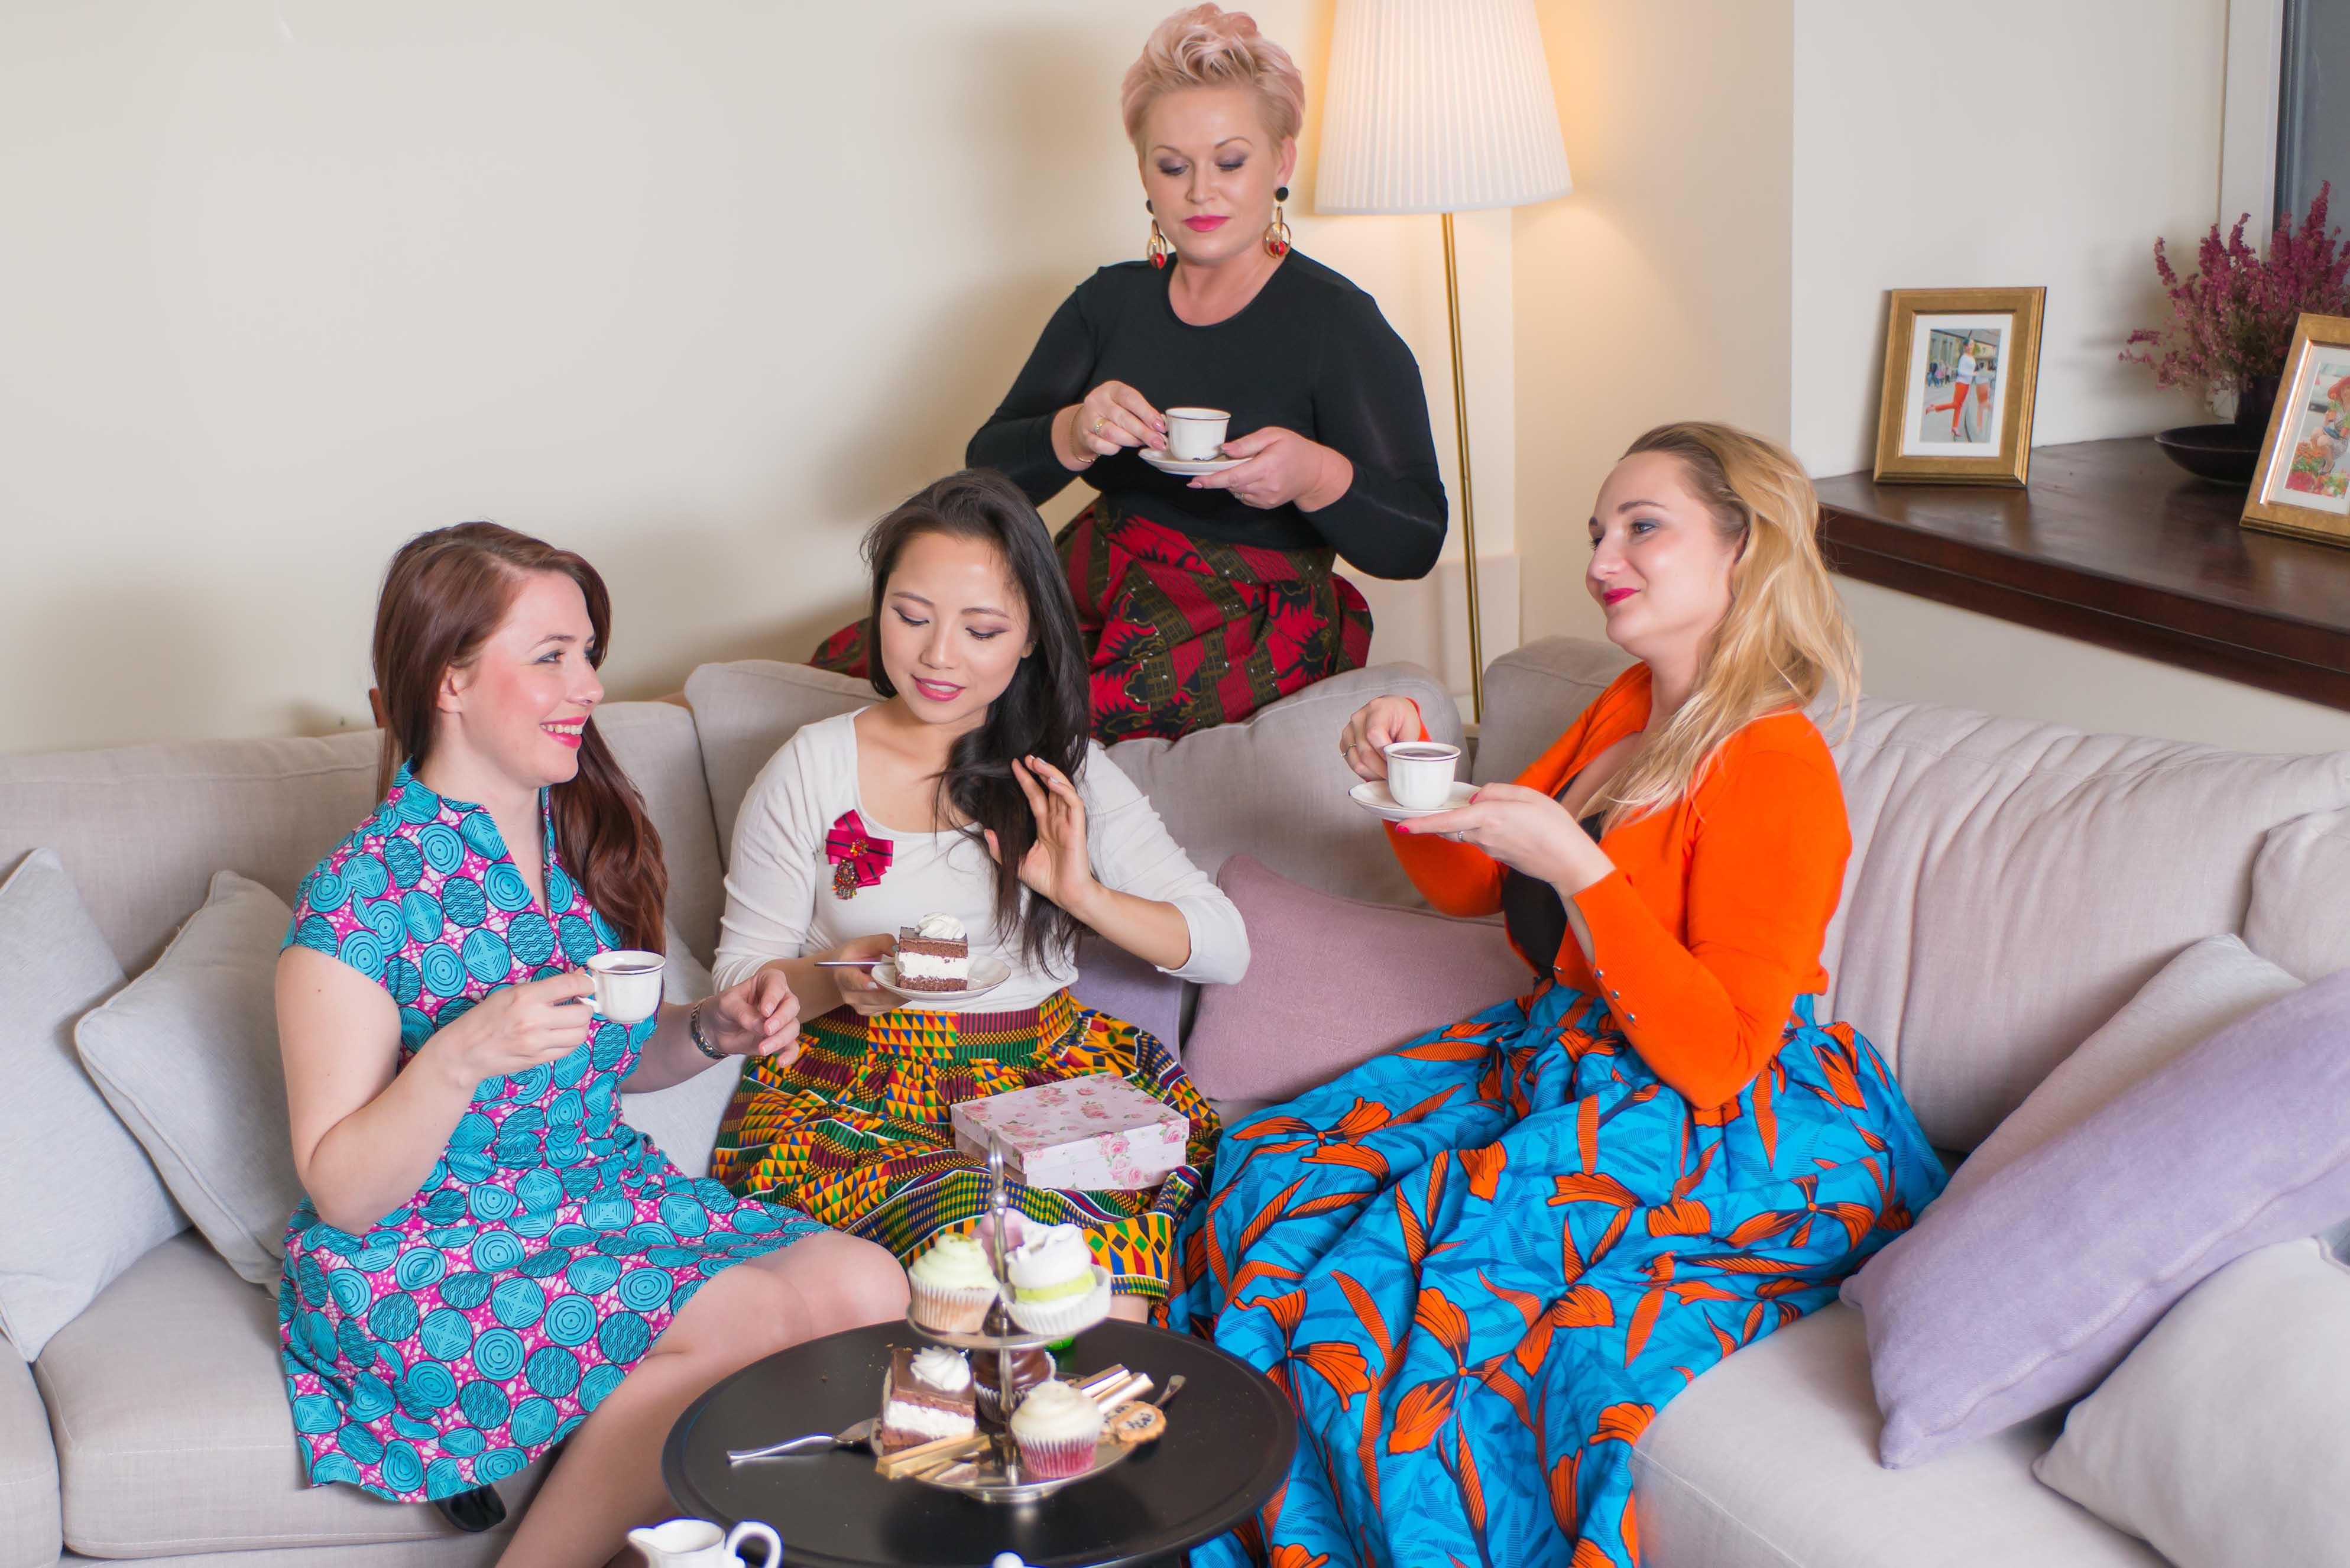 Taye-africanprint-dress-skirts-fashion-Warsaw-Poland